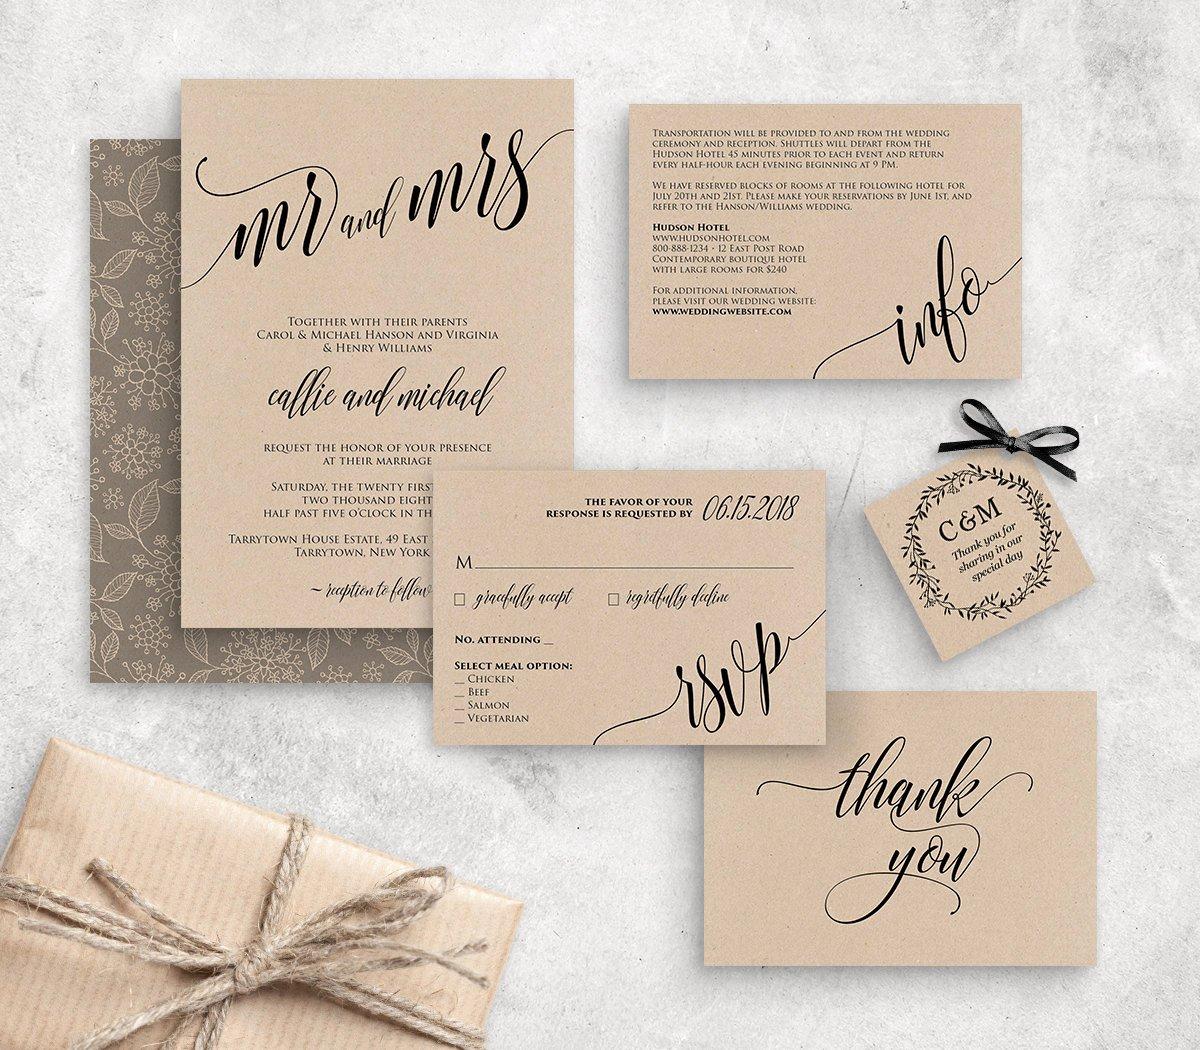 Rustic Wedding Invitations Template Inspirational Wedding Invitation Template Instant Download Rustic Modern